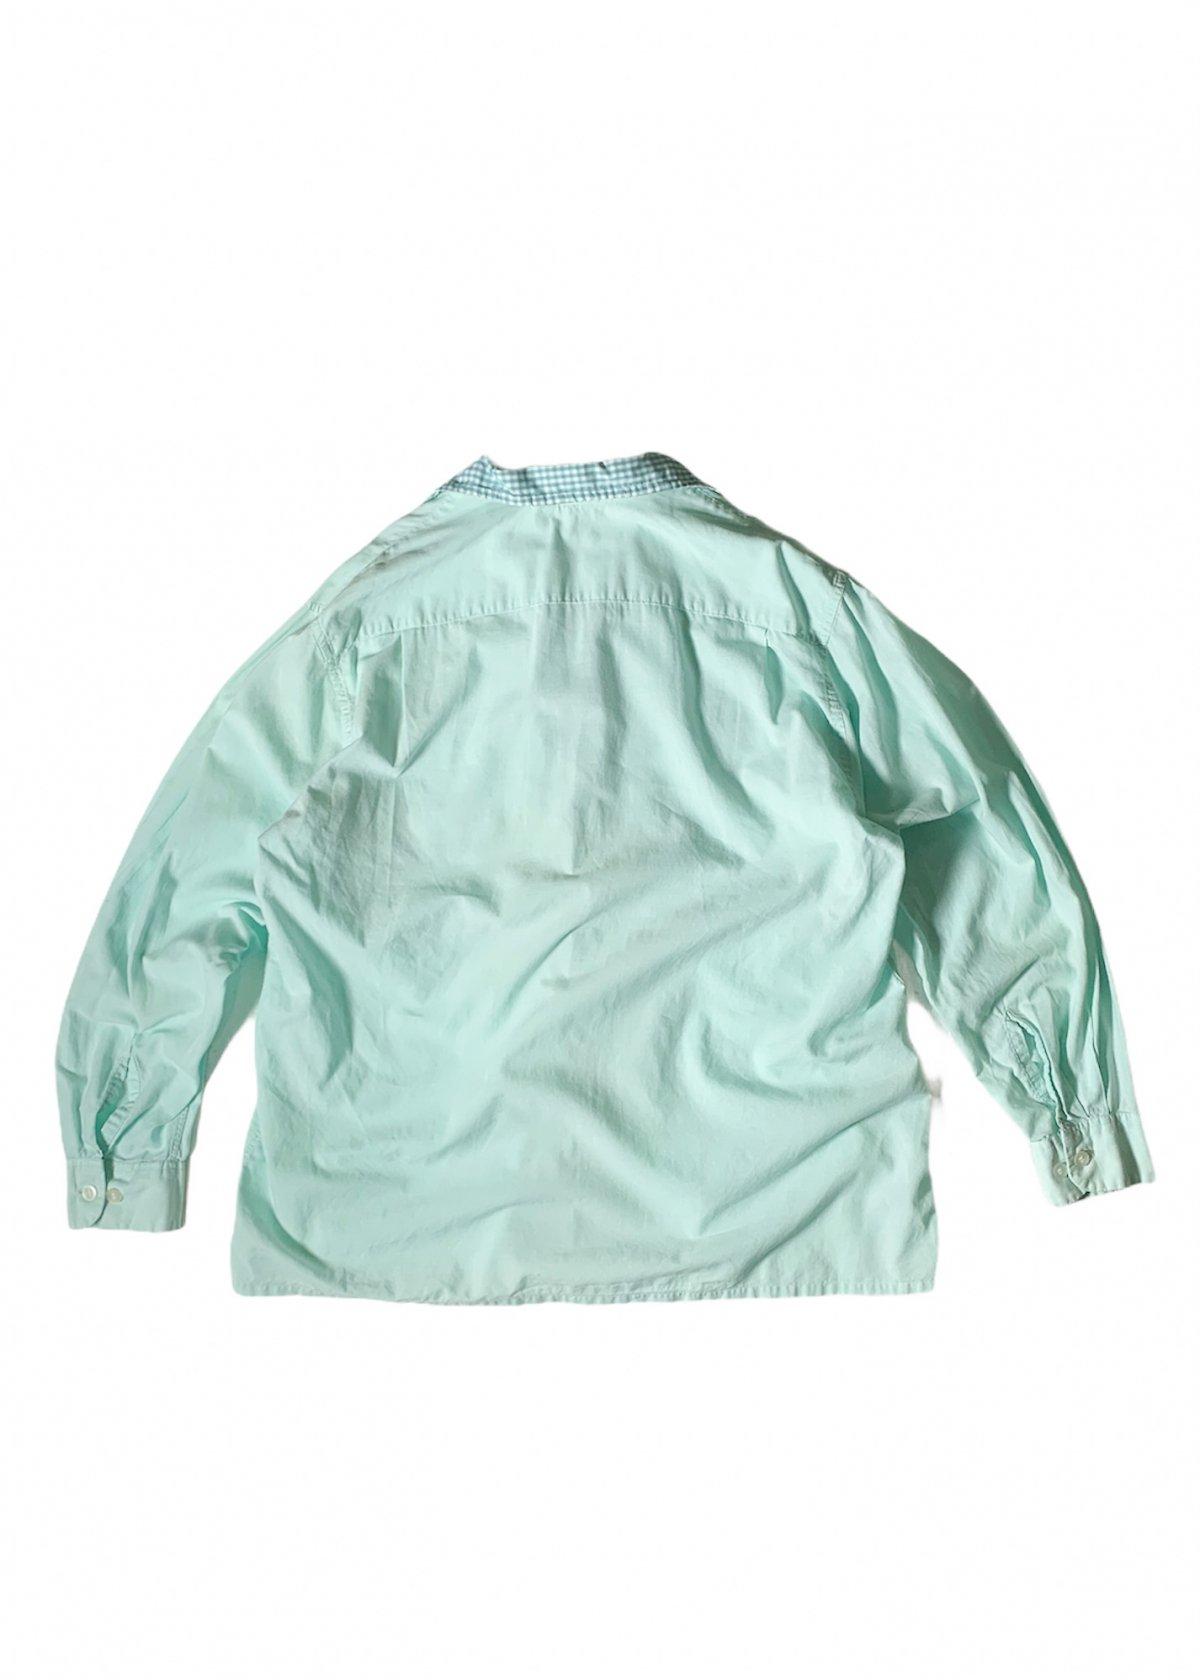 "I&I 古着 通販 ""PENNY'S TOWNCRAFT"" Pajama L/S Shirt 詳細画像4"